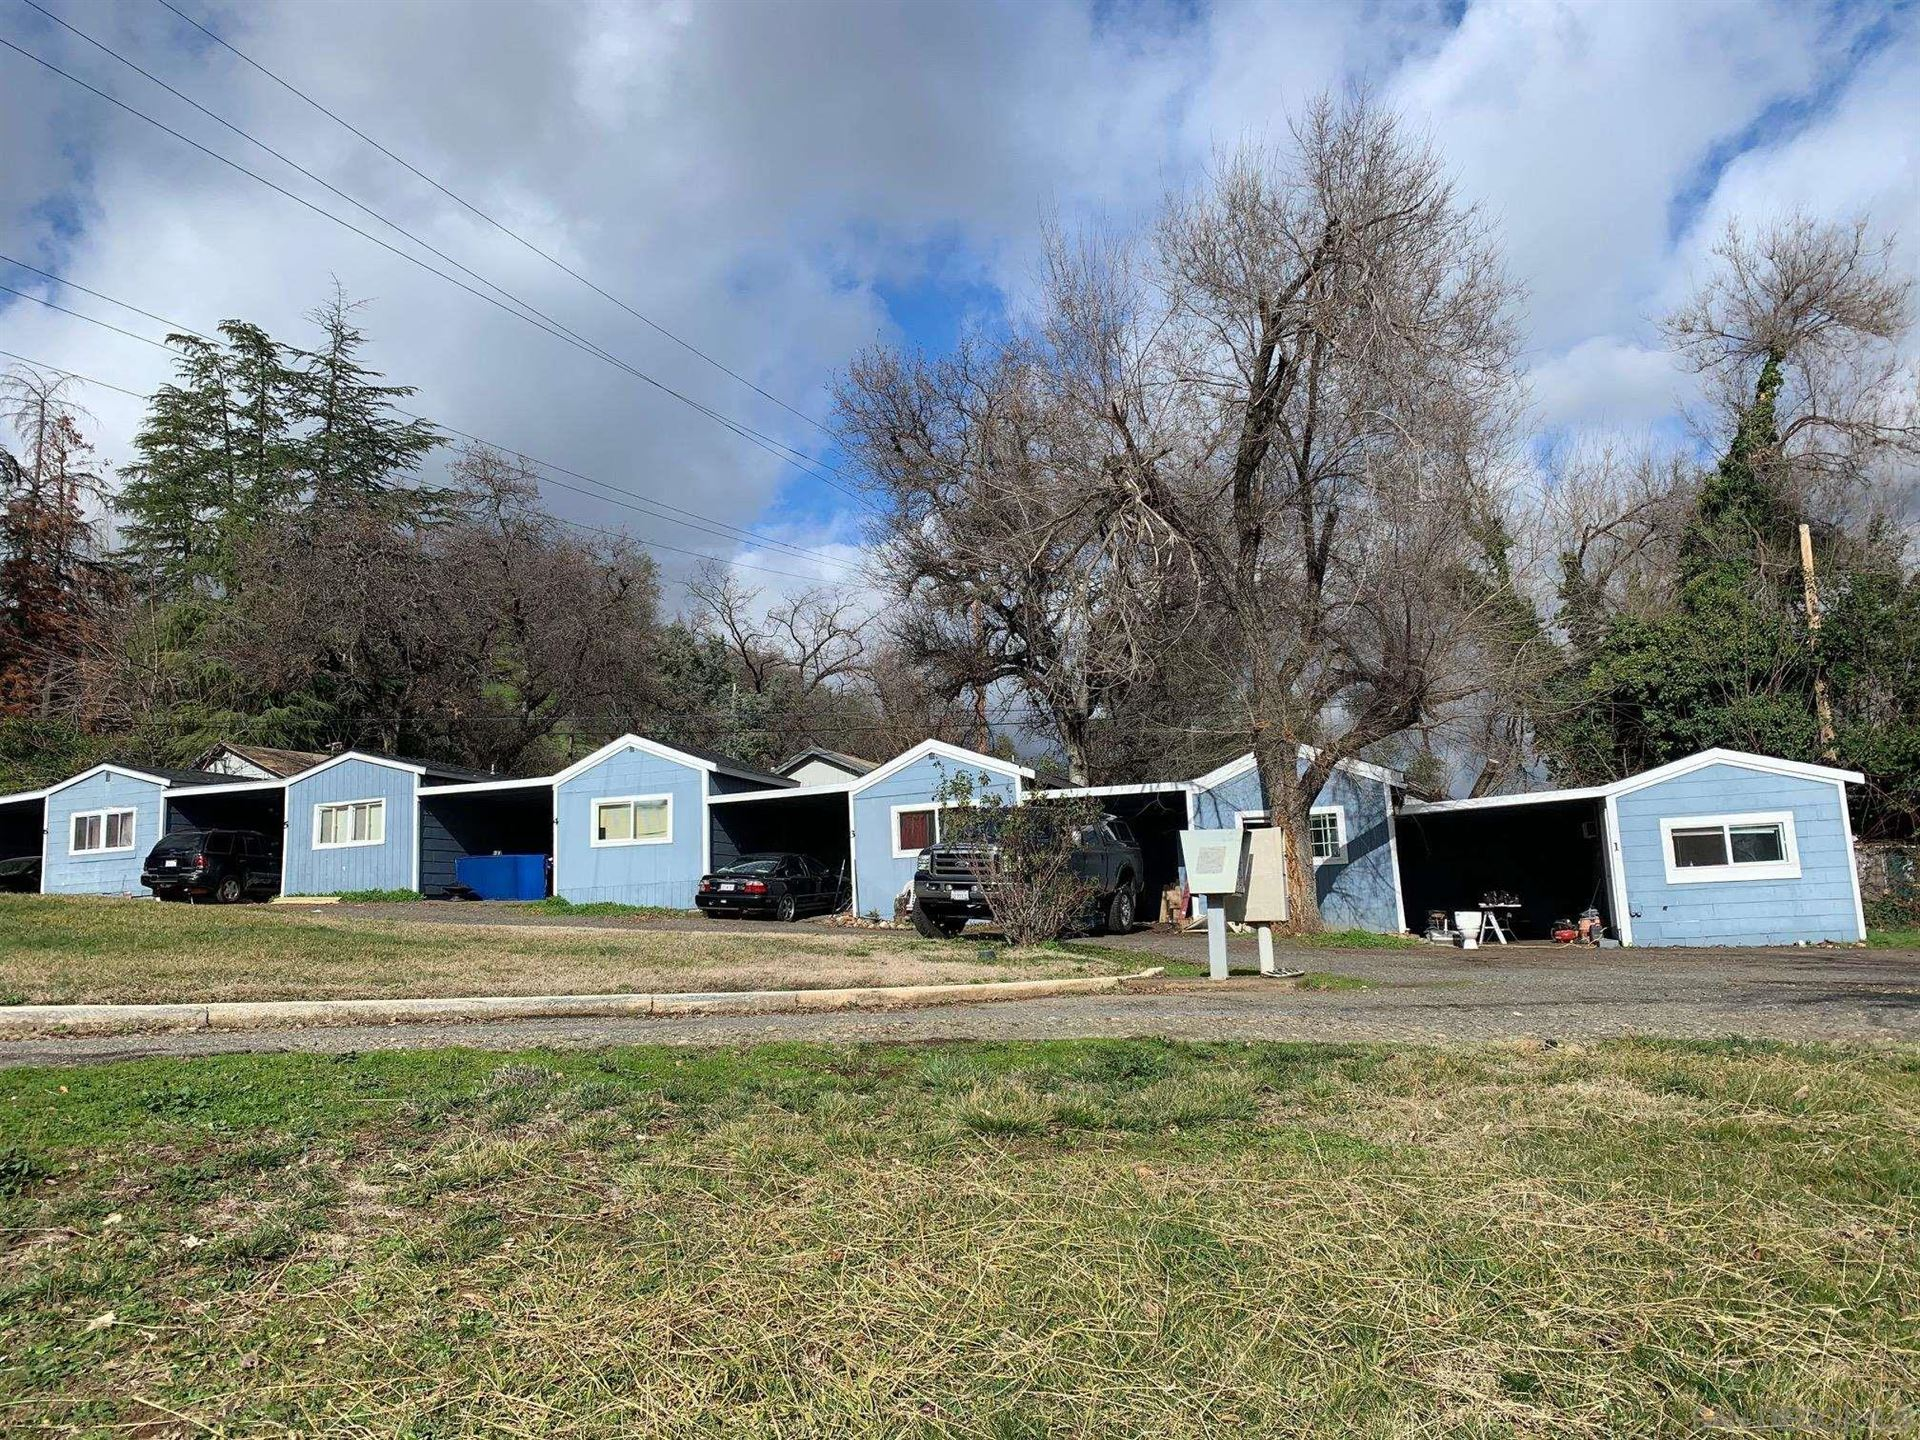 Photo of 4070 Railroad Ave, Redding, CA 96001 (MLS # 210025240)